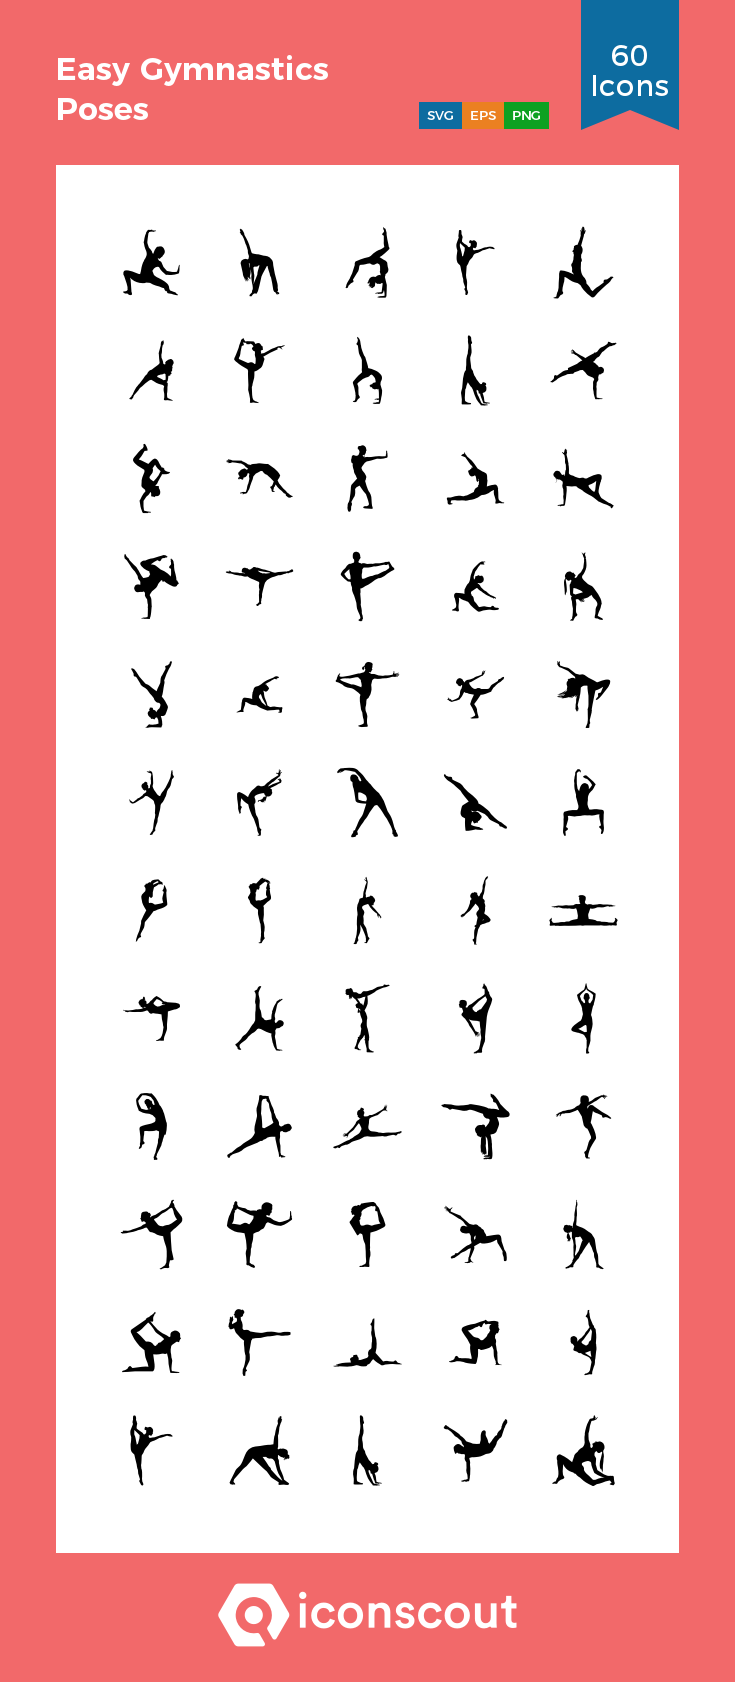 Easy Gymnastics Poses  Icon Pack - 60 Glyph Icons